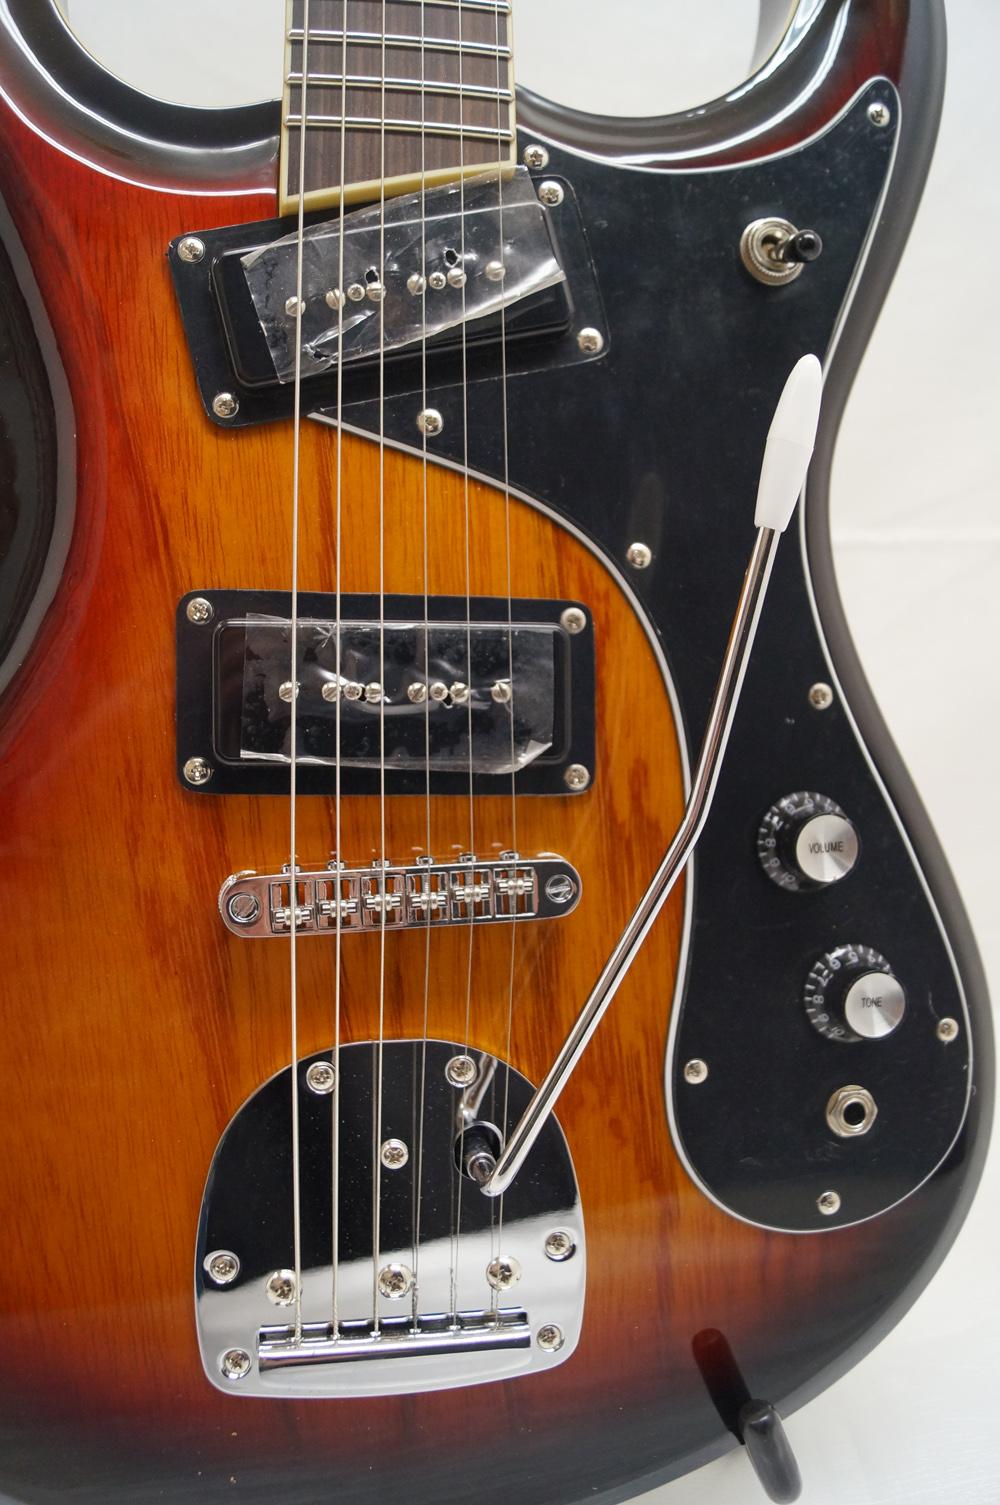 new dillion dmg 75t electric guitar w gig bag vintage features. Black Bedroom Furniture Sets. Home Design Ideas